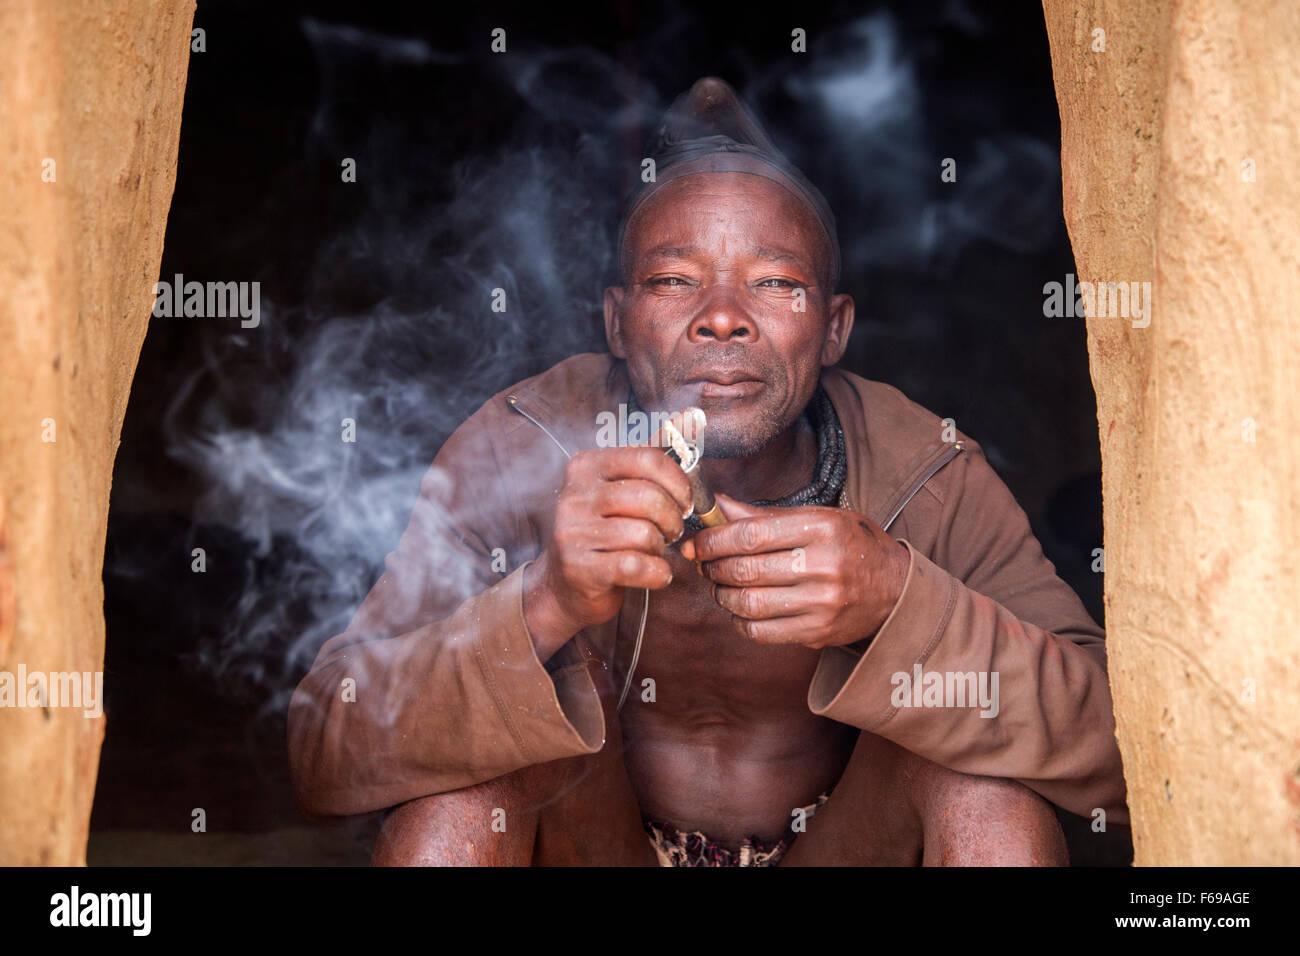 Himba man smoking pipe, Kaokoveld Namibia - Stock Image